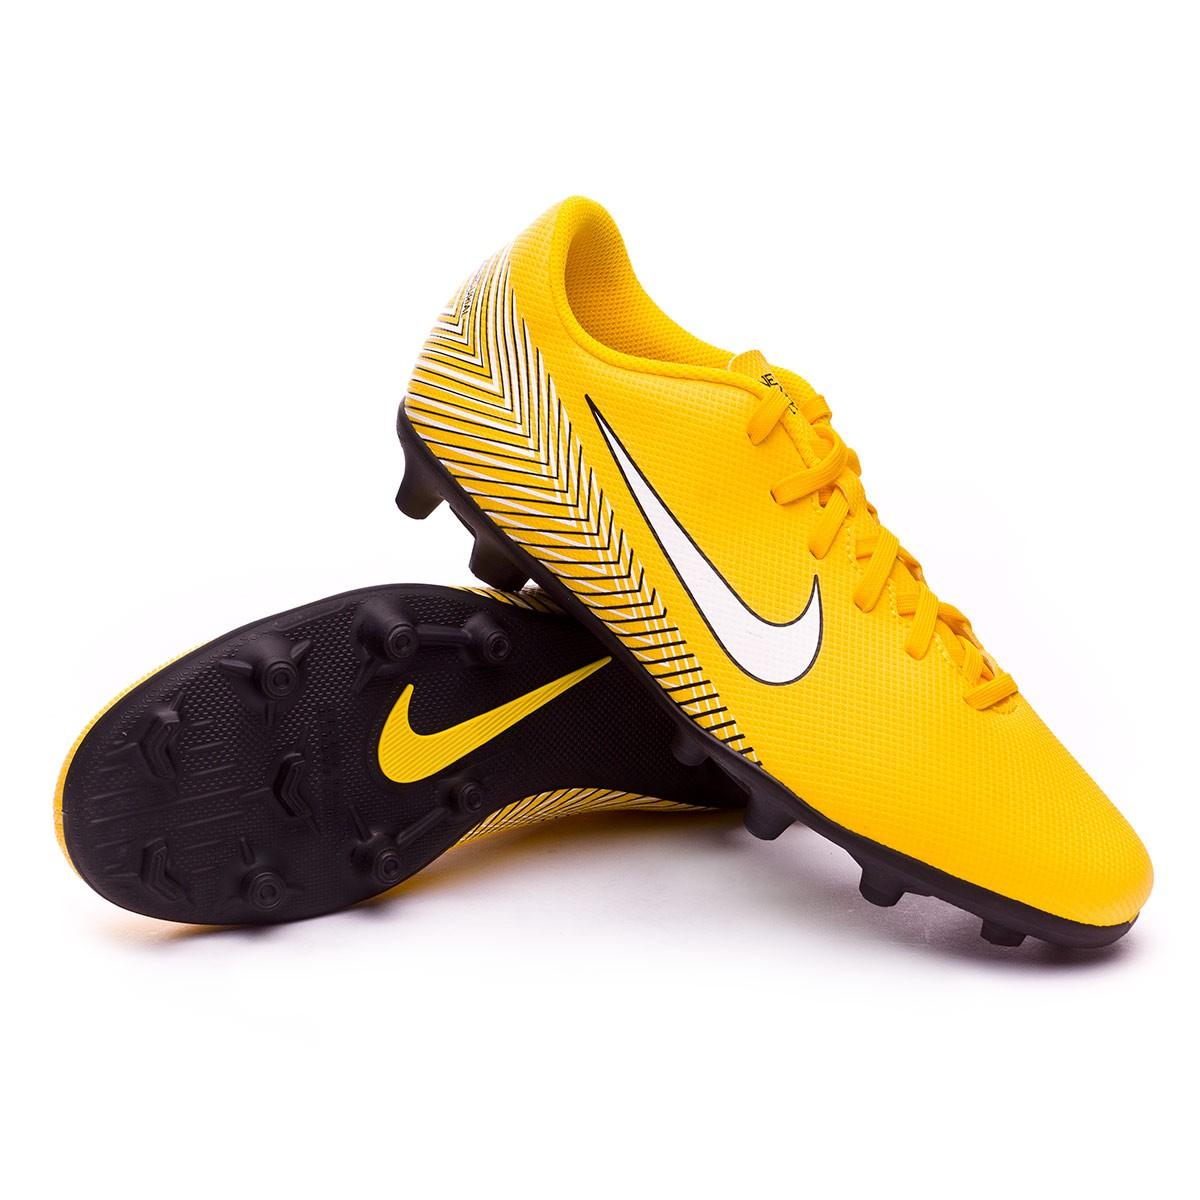 21e61d9c68a9 Football Boots Nike Mercurial Vapor XII Club MG Neymar Yellow-Black -  Football store Fútbol Emotion